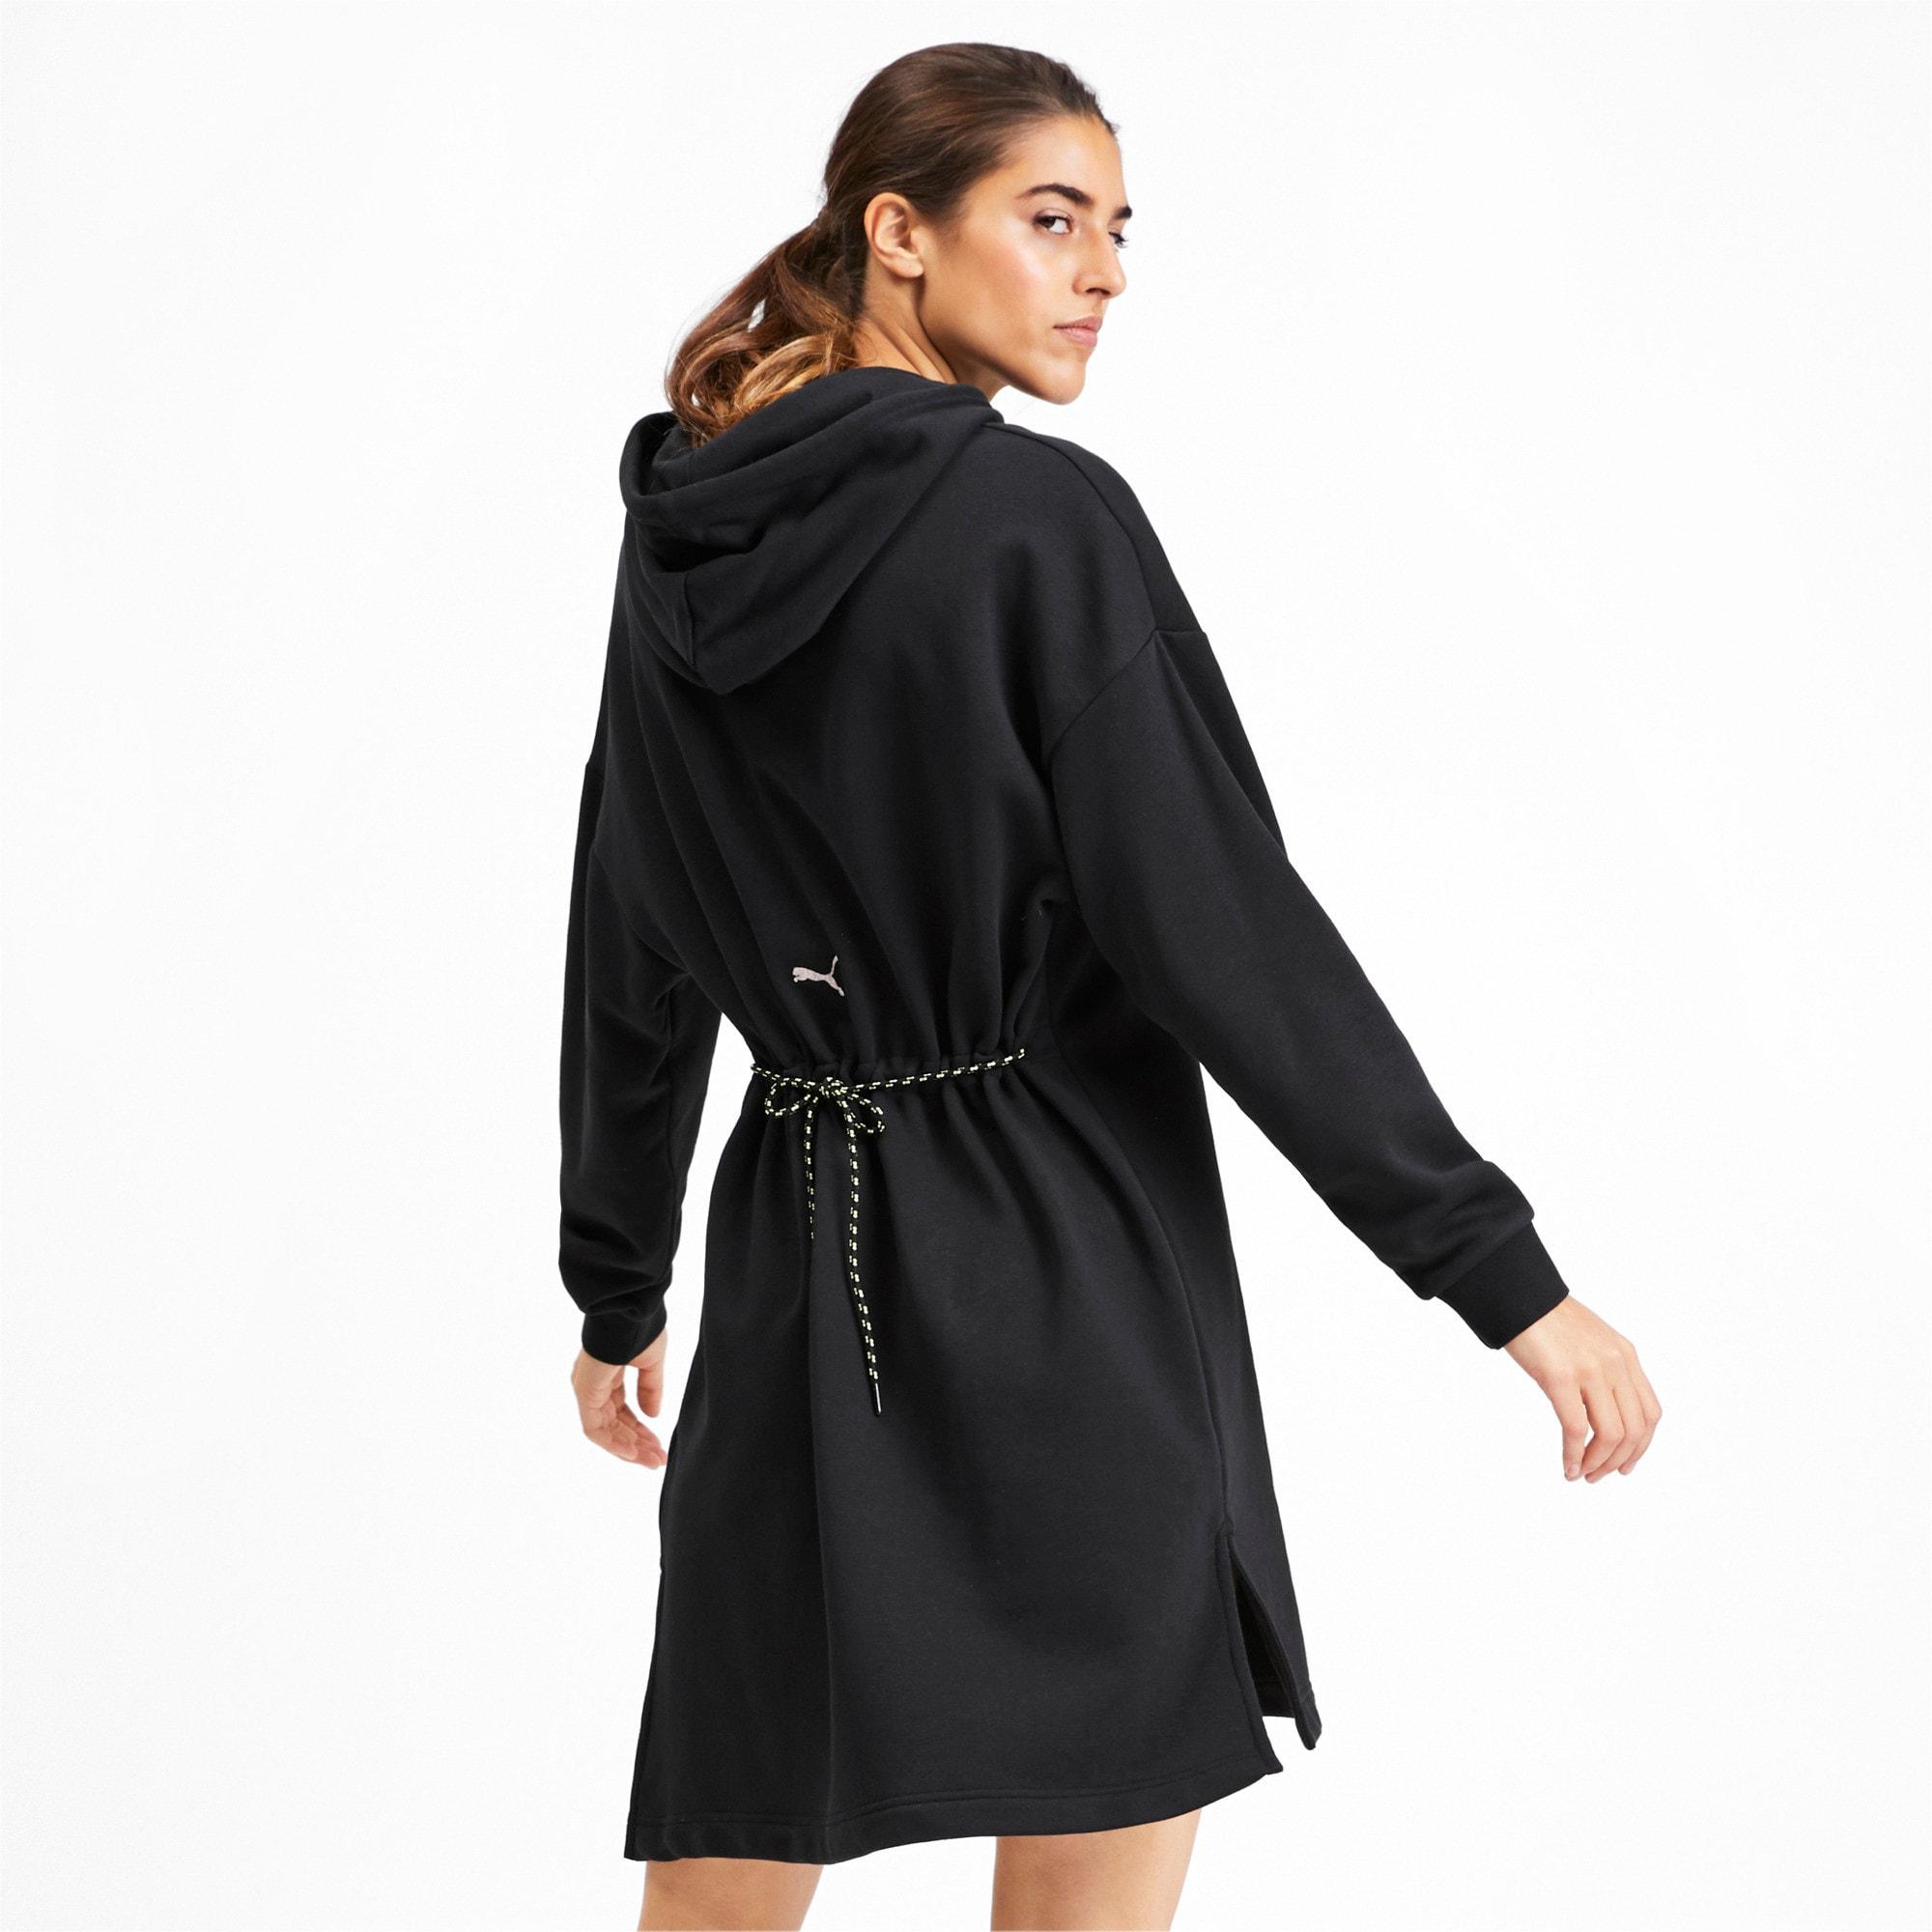 Thumbnail 2 of Chase Hooded Women's Dress, Puma Black, medium